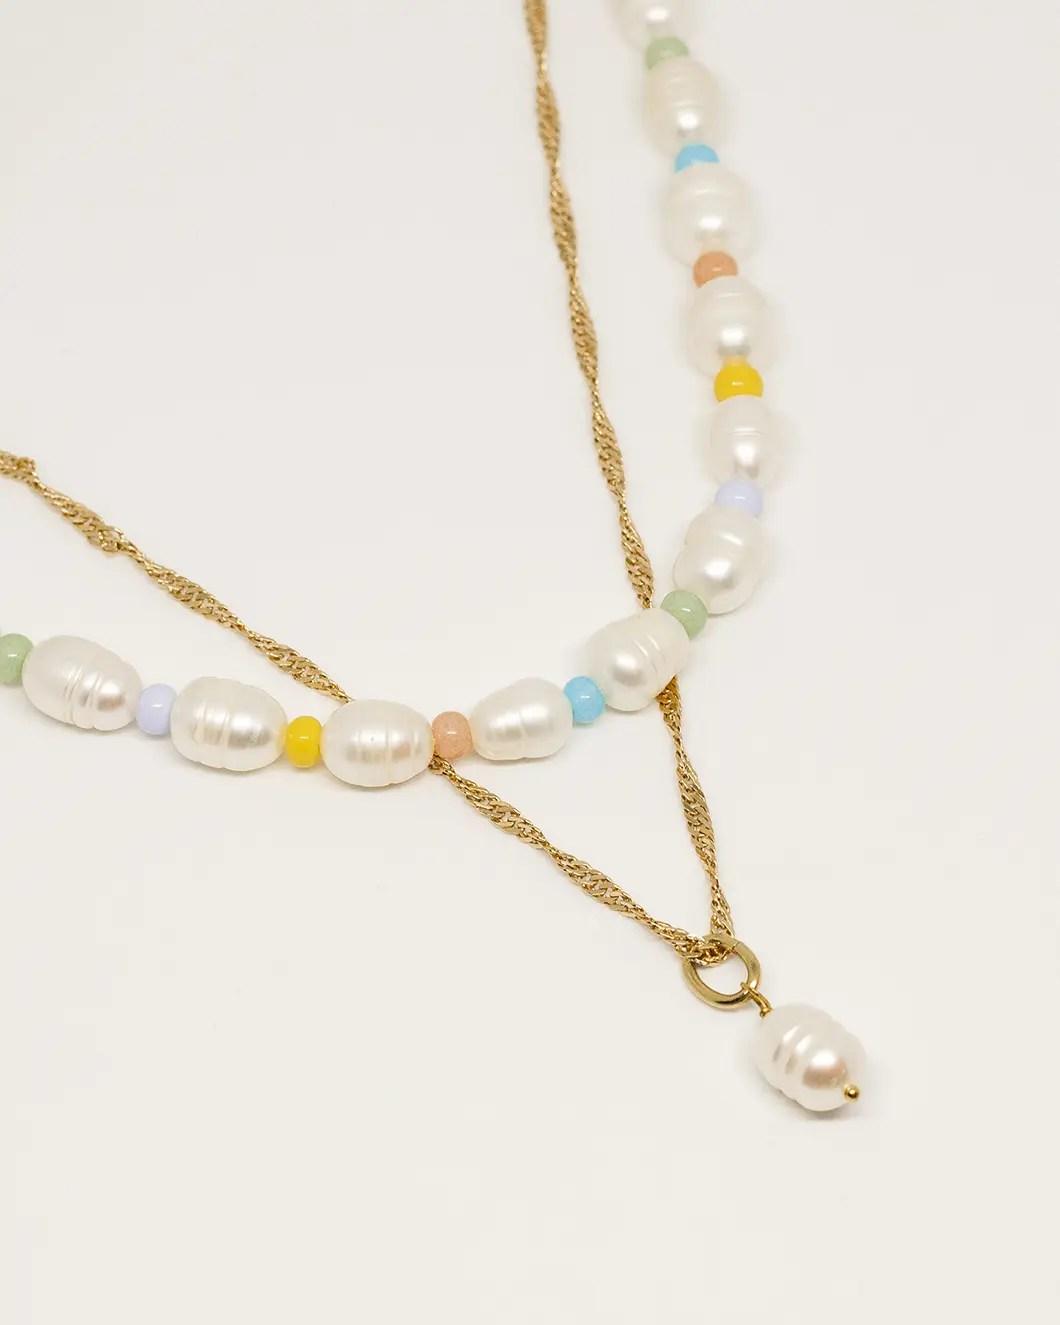 Collier perles de rocailles perles de culture